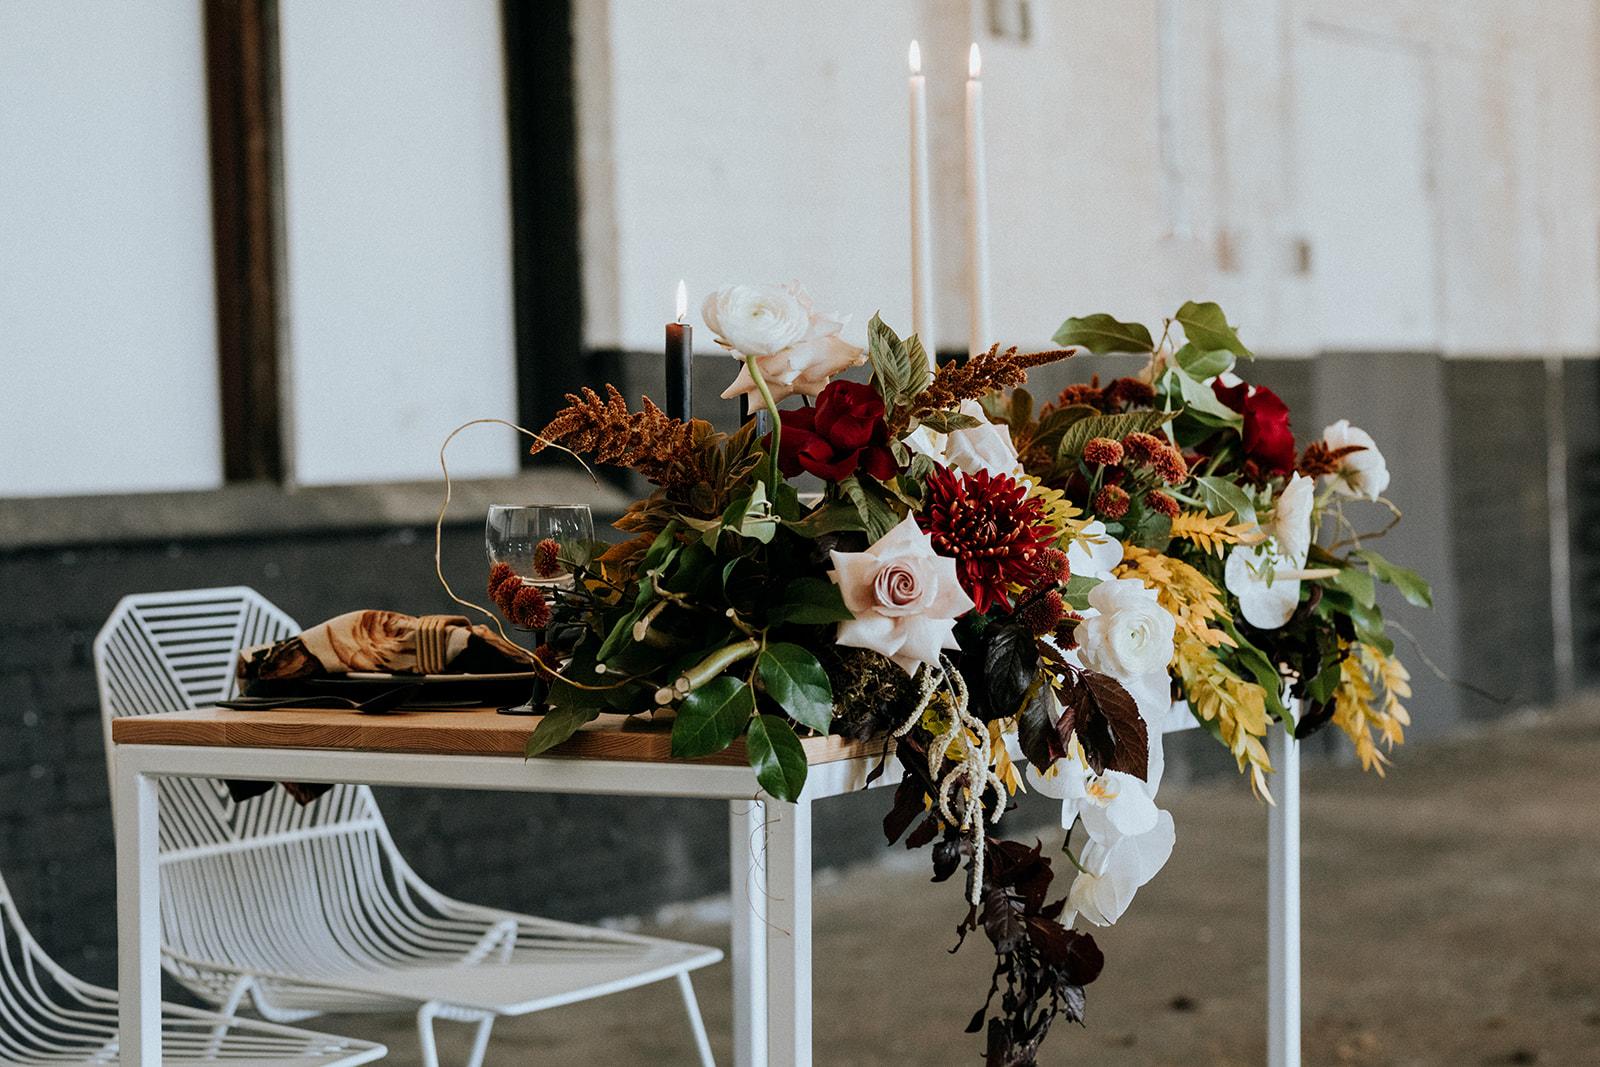 Roundhouse_-_Industrial_Wedding_-_Kim_Jay_Photo-16.jpg